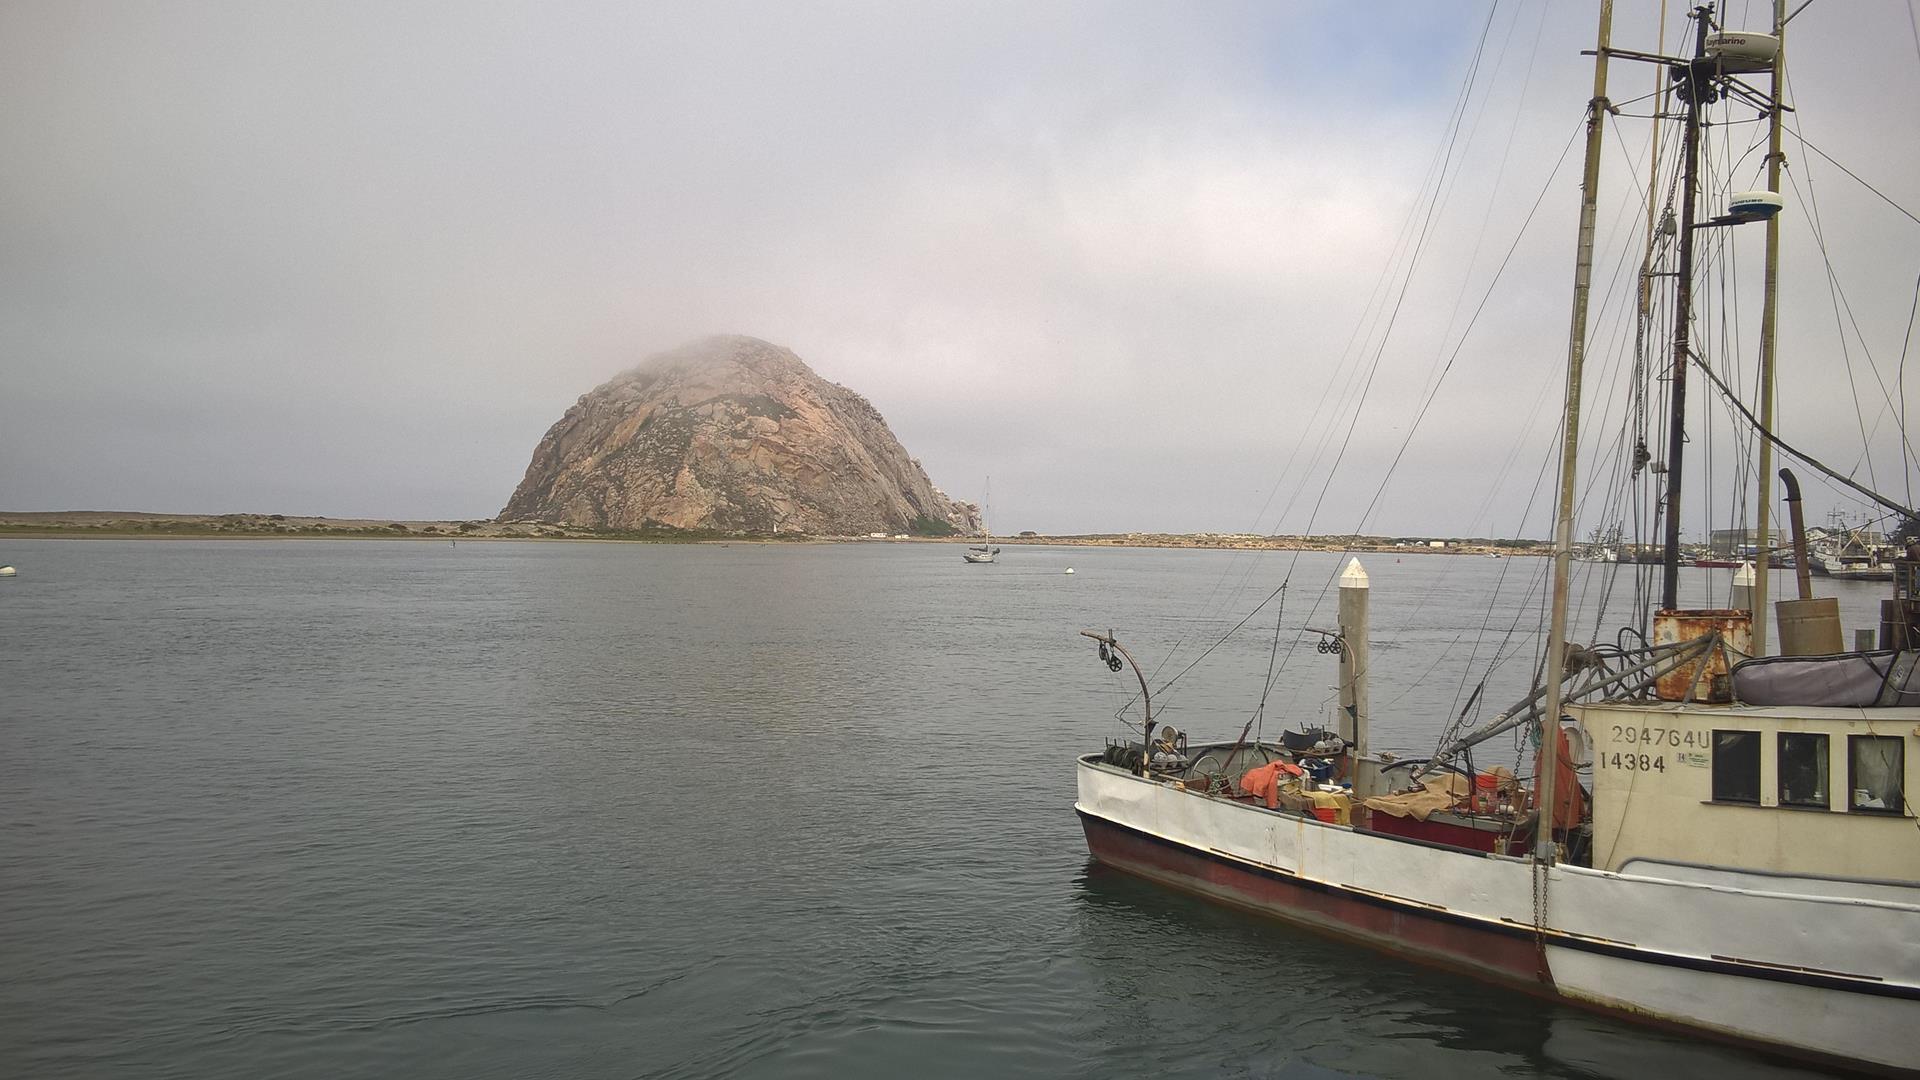 Morro Bay war heute Morgen recht nebelig